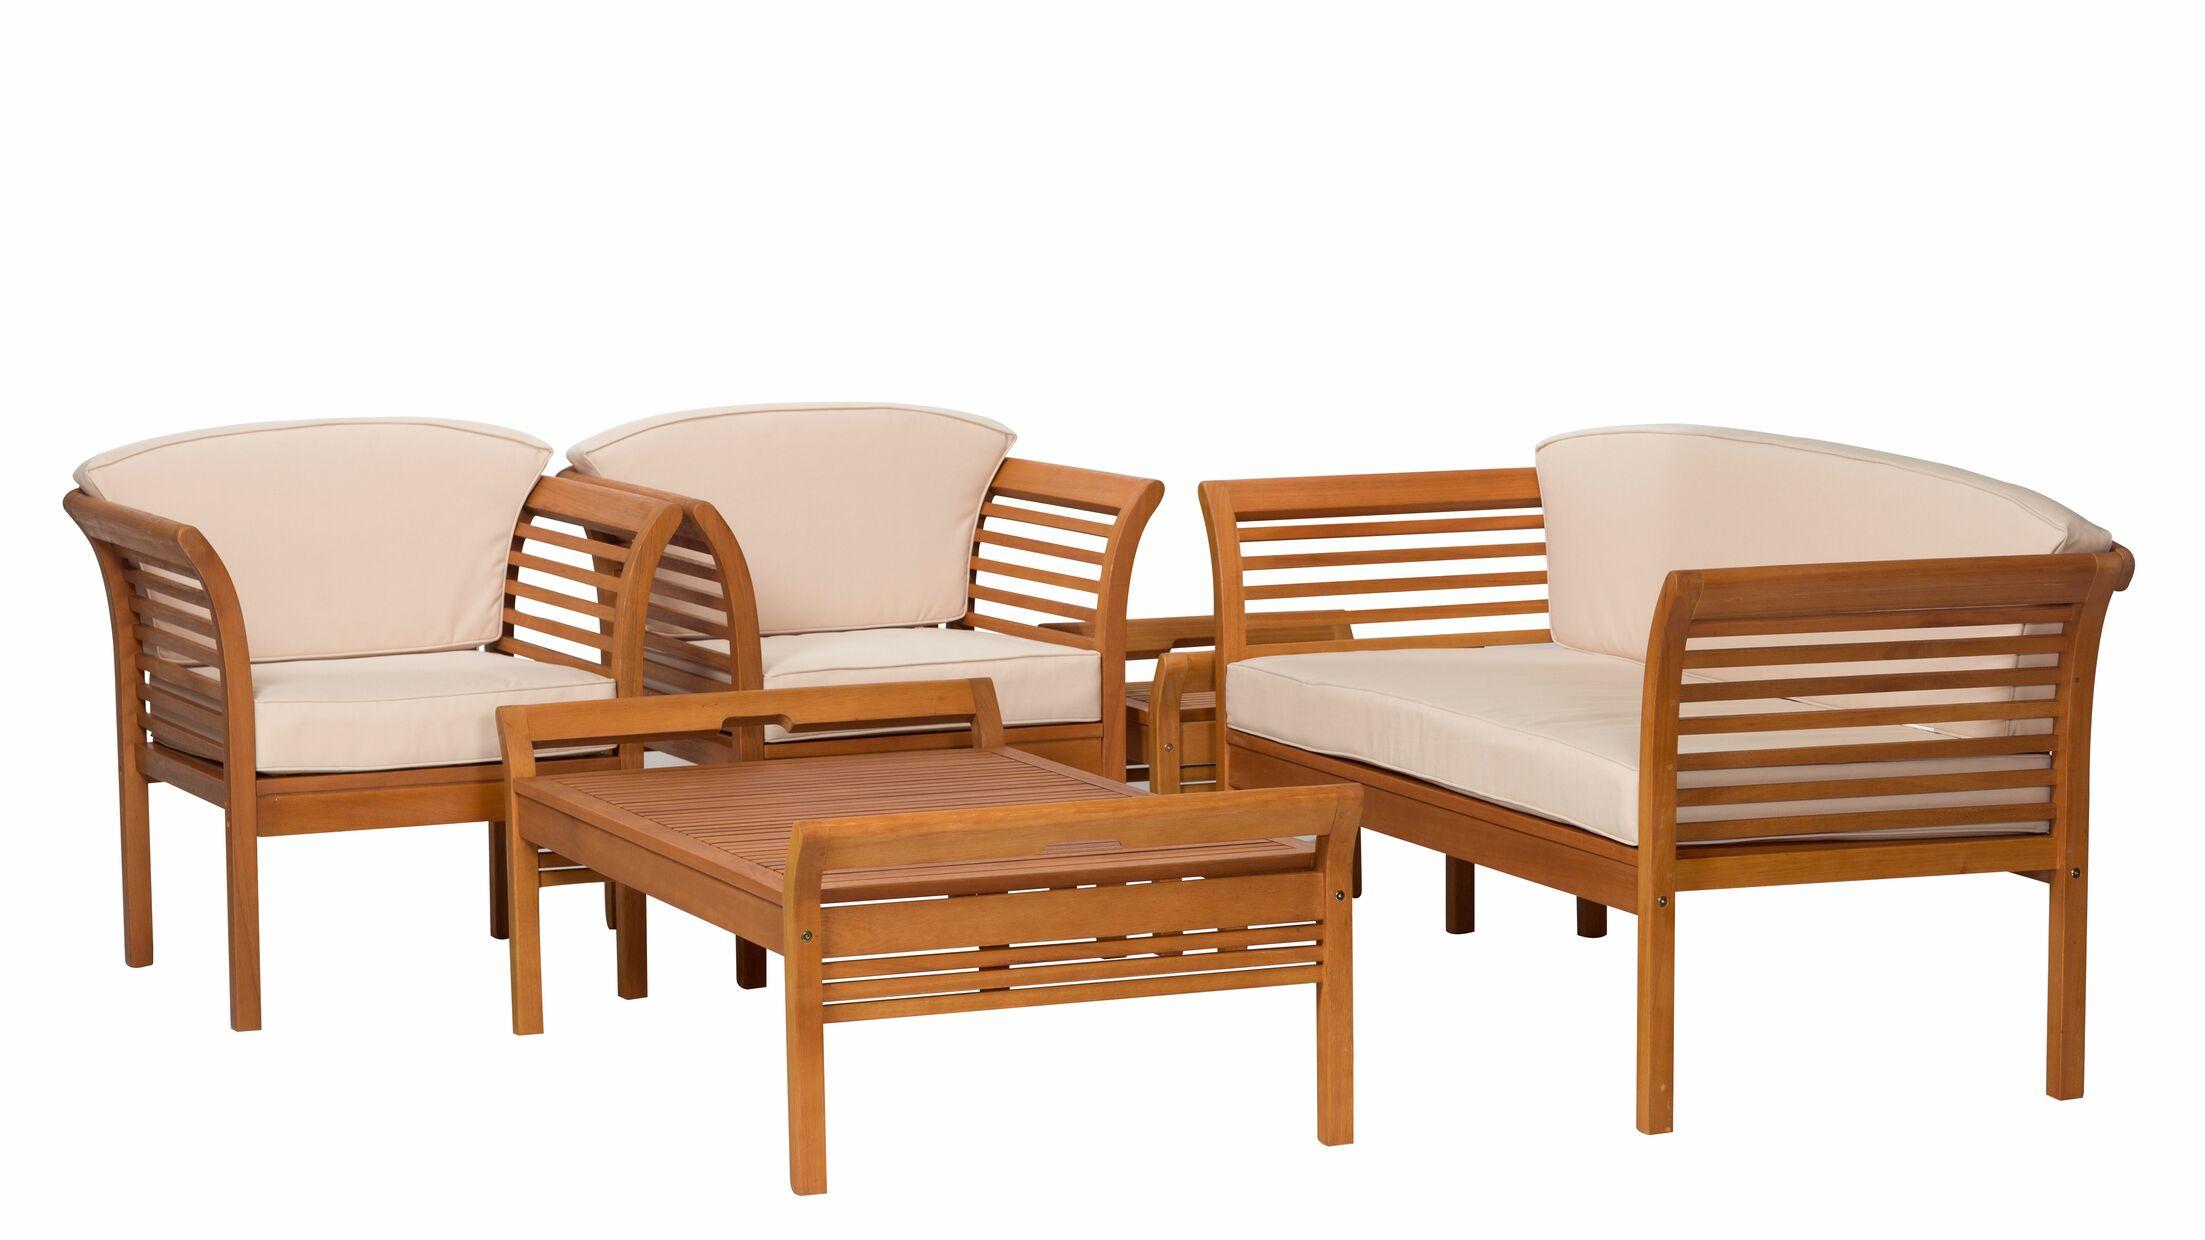 Eastlawn Eucalyptus 5 Piece Sofa Set with Cushions